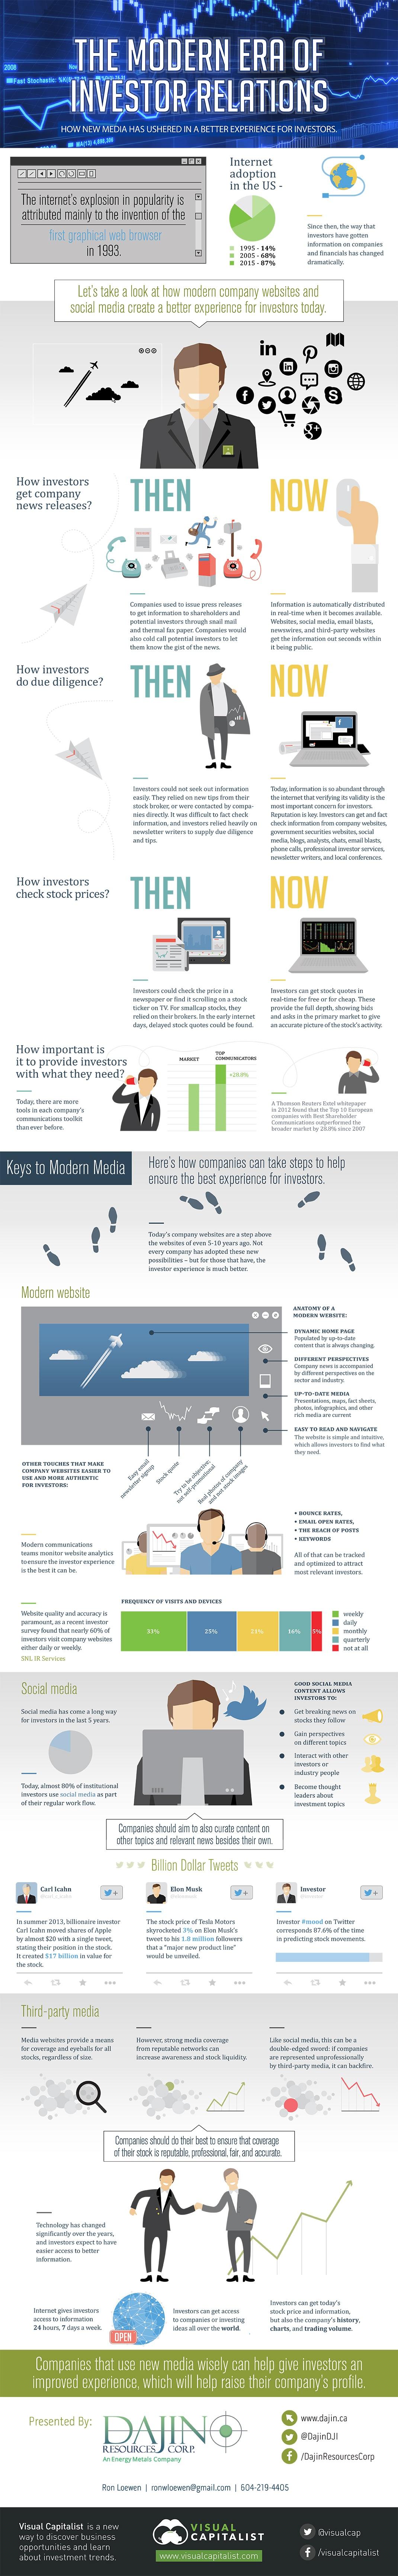 modern-era-ir-infographic VISUAL CAPITALIST